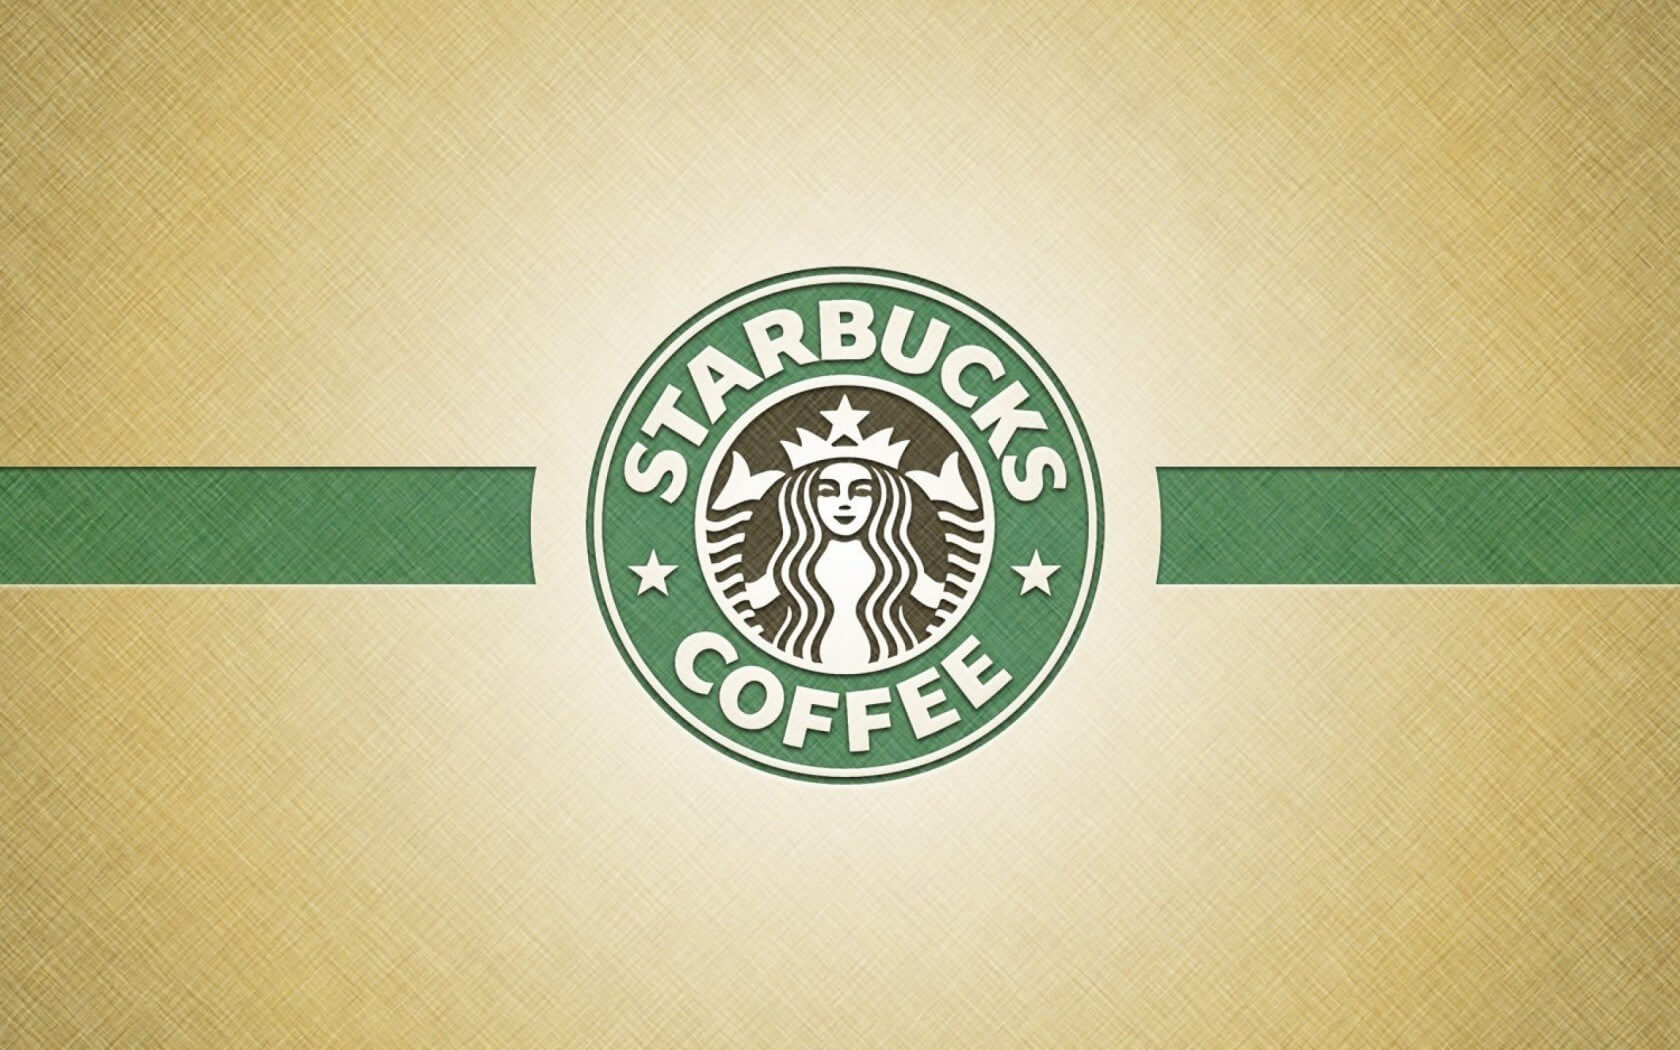 Starbucks Ppt Background - Powerpoint Backgrounds For Free Regarding Starbucks Powerpoint Template